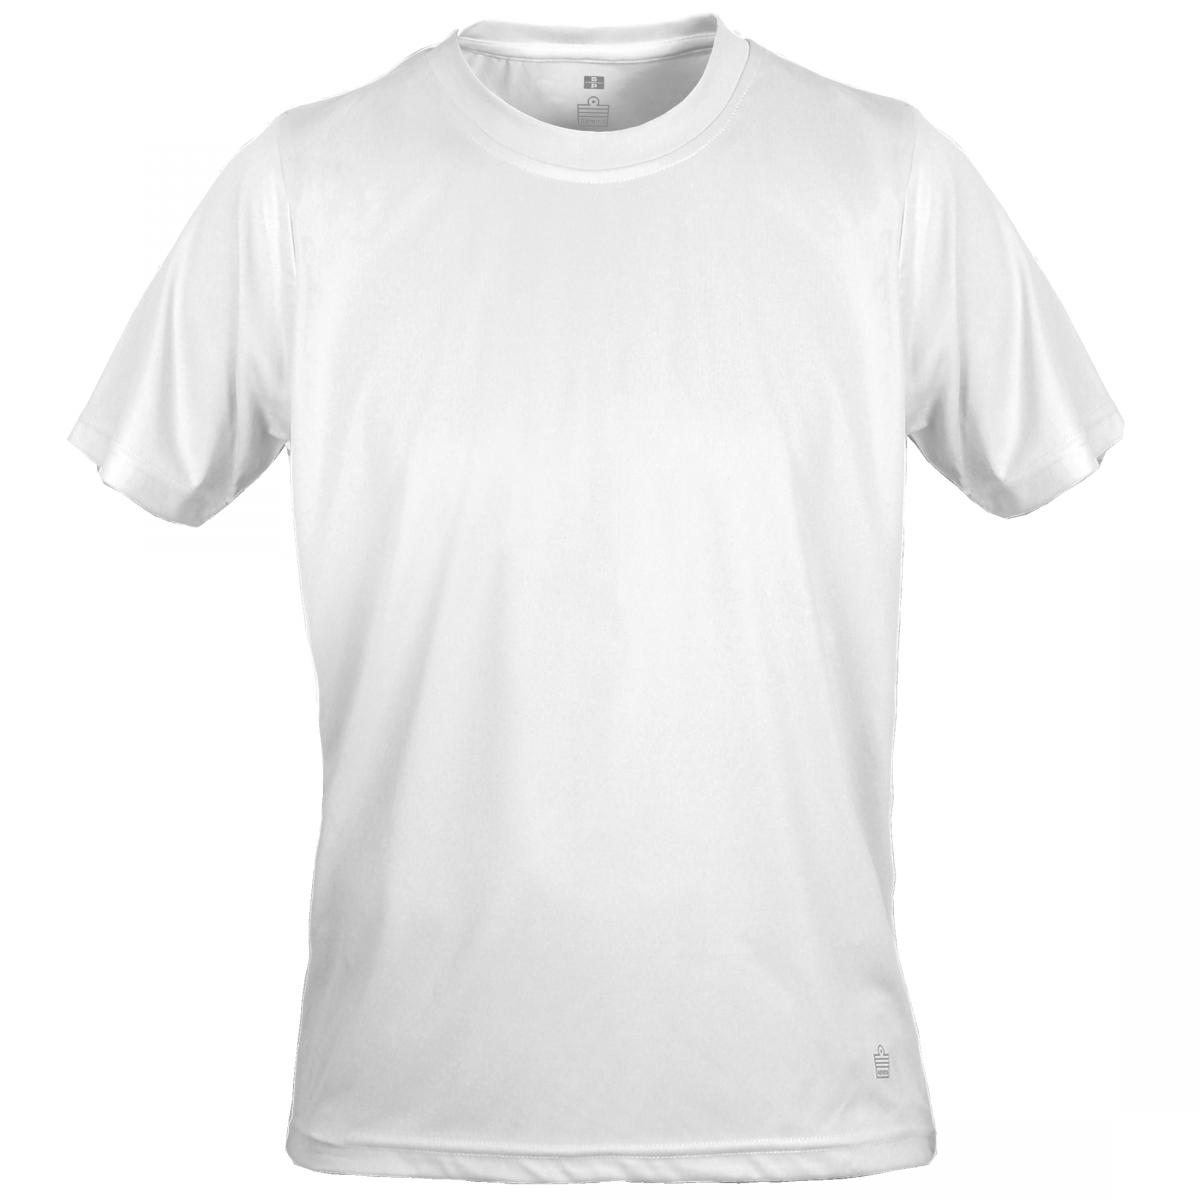 Admiral Performance Jersey-White-XL